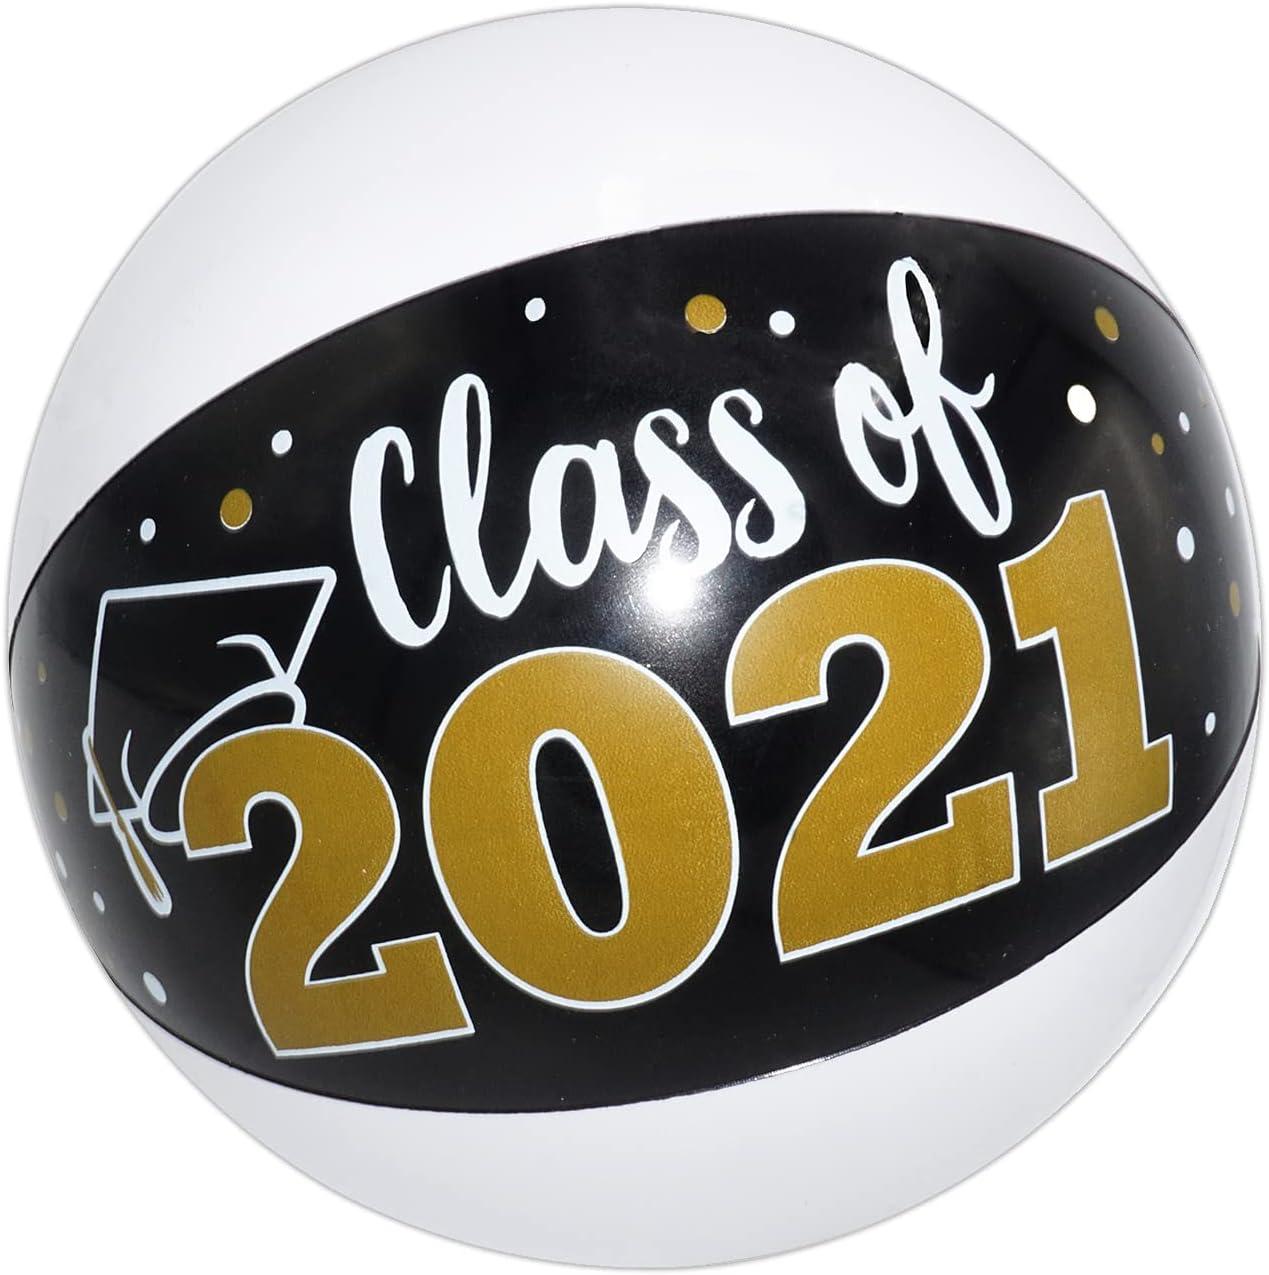 12 Pcs Graduation Beach Balls Class of Max Popular brand in the world 65% OFF 11